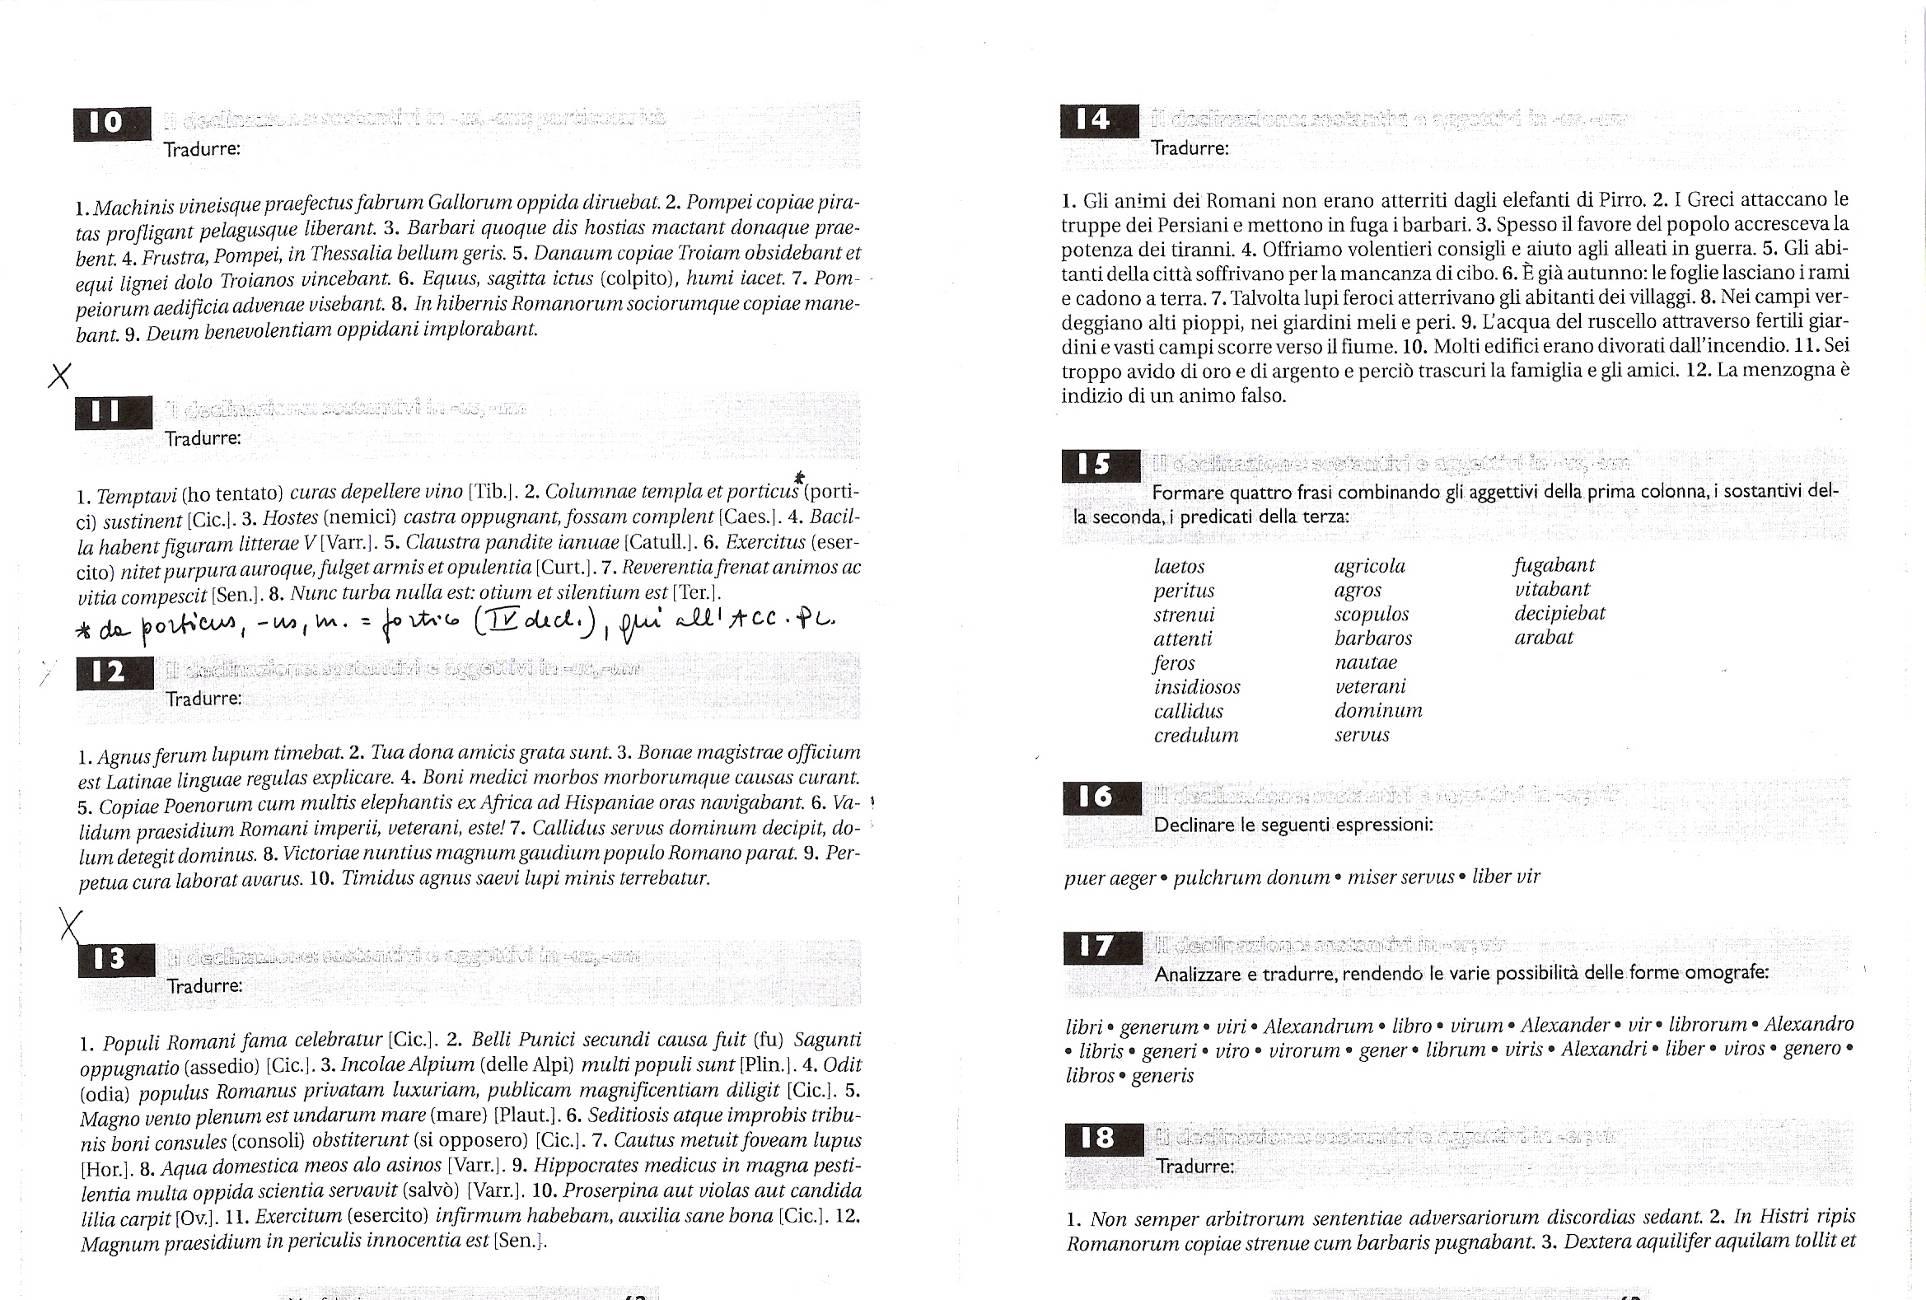 dating traduttore verbo essere latino dating - rozamira.info